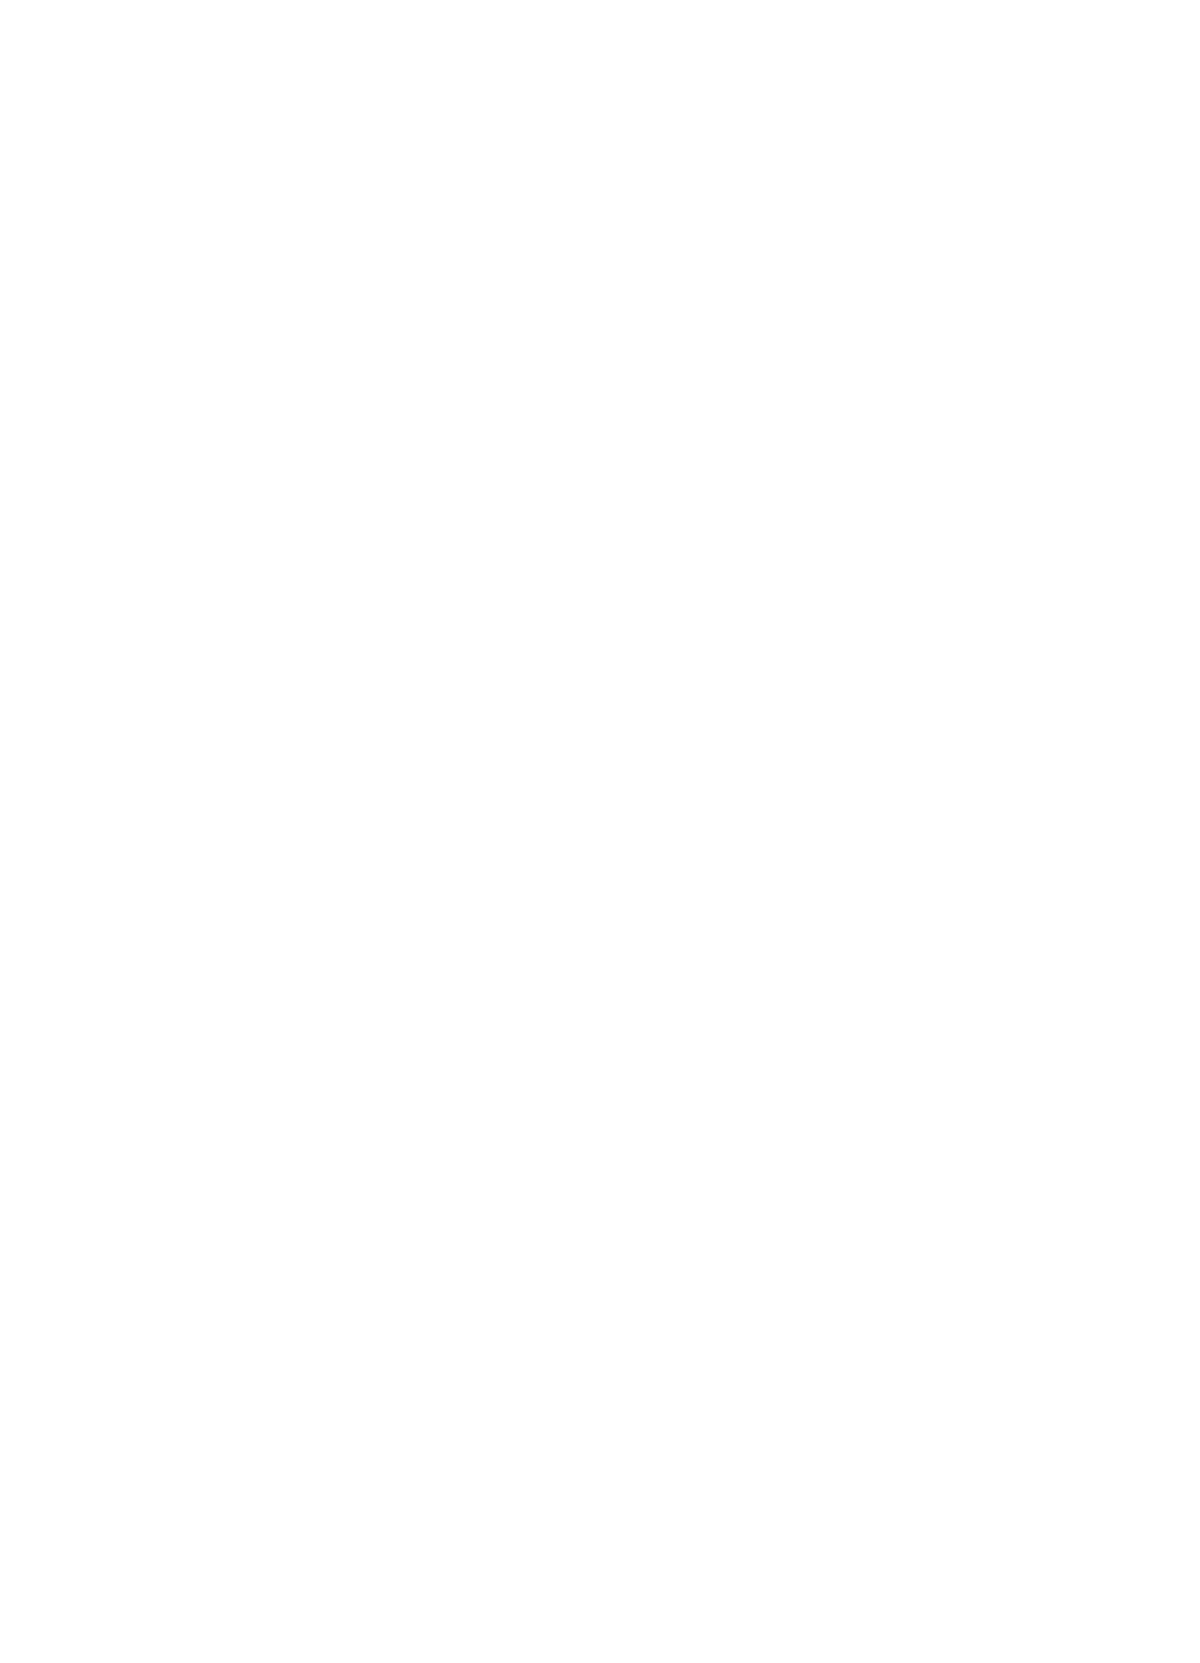 [Oshiruko Kan (Piririnegi)] Futanari! Oshioki Time 2 ~Shasei Kanri Kyousei Josou Hen~ | Futanari! Punishment Time 2 [English] [Forbiddenfetish77] [Digital] 2